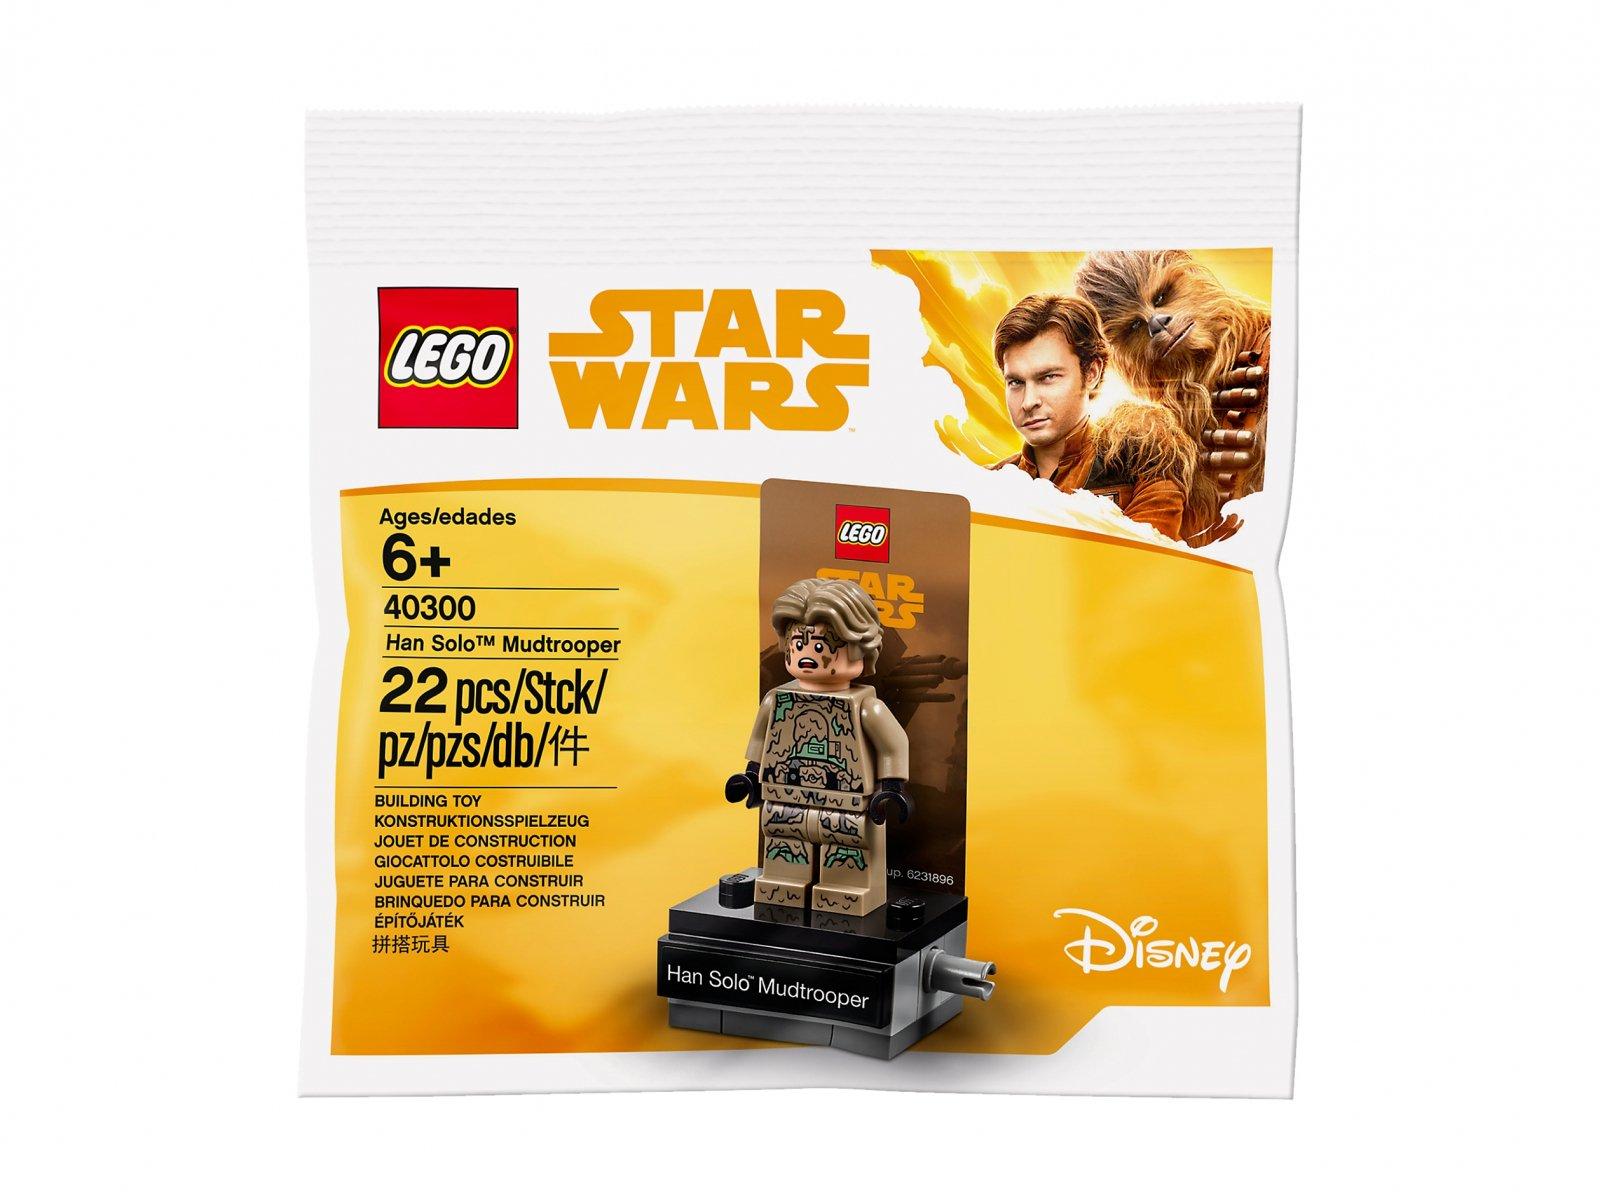 LEGO 40300 Han Solo™ w pancerzu Mudtroopera